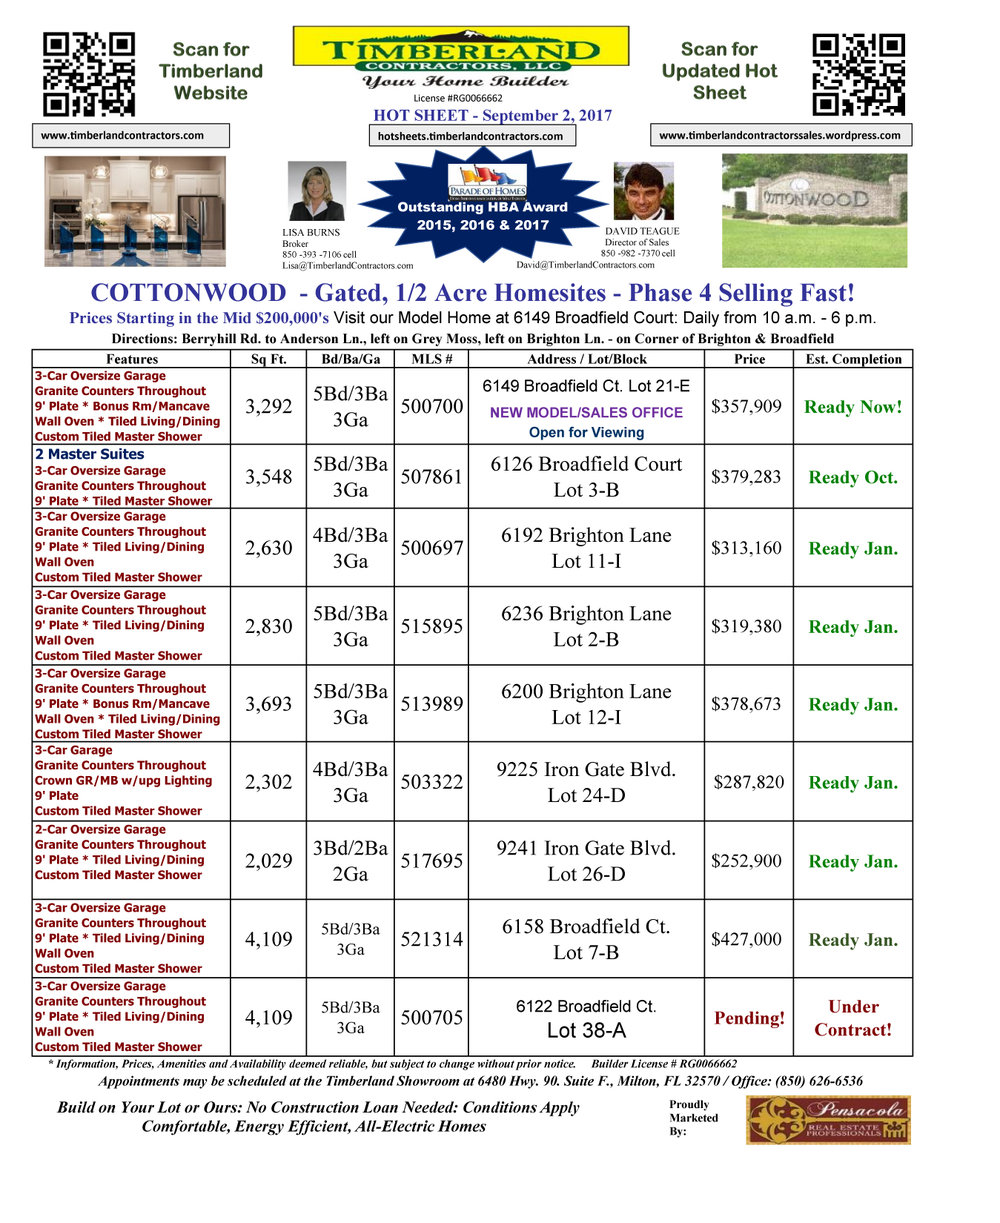 Hot Sheet Cottonwood September 2, 2017 Timberland.jpg